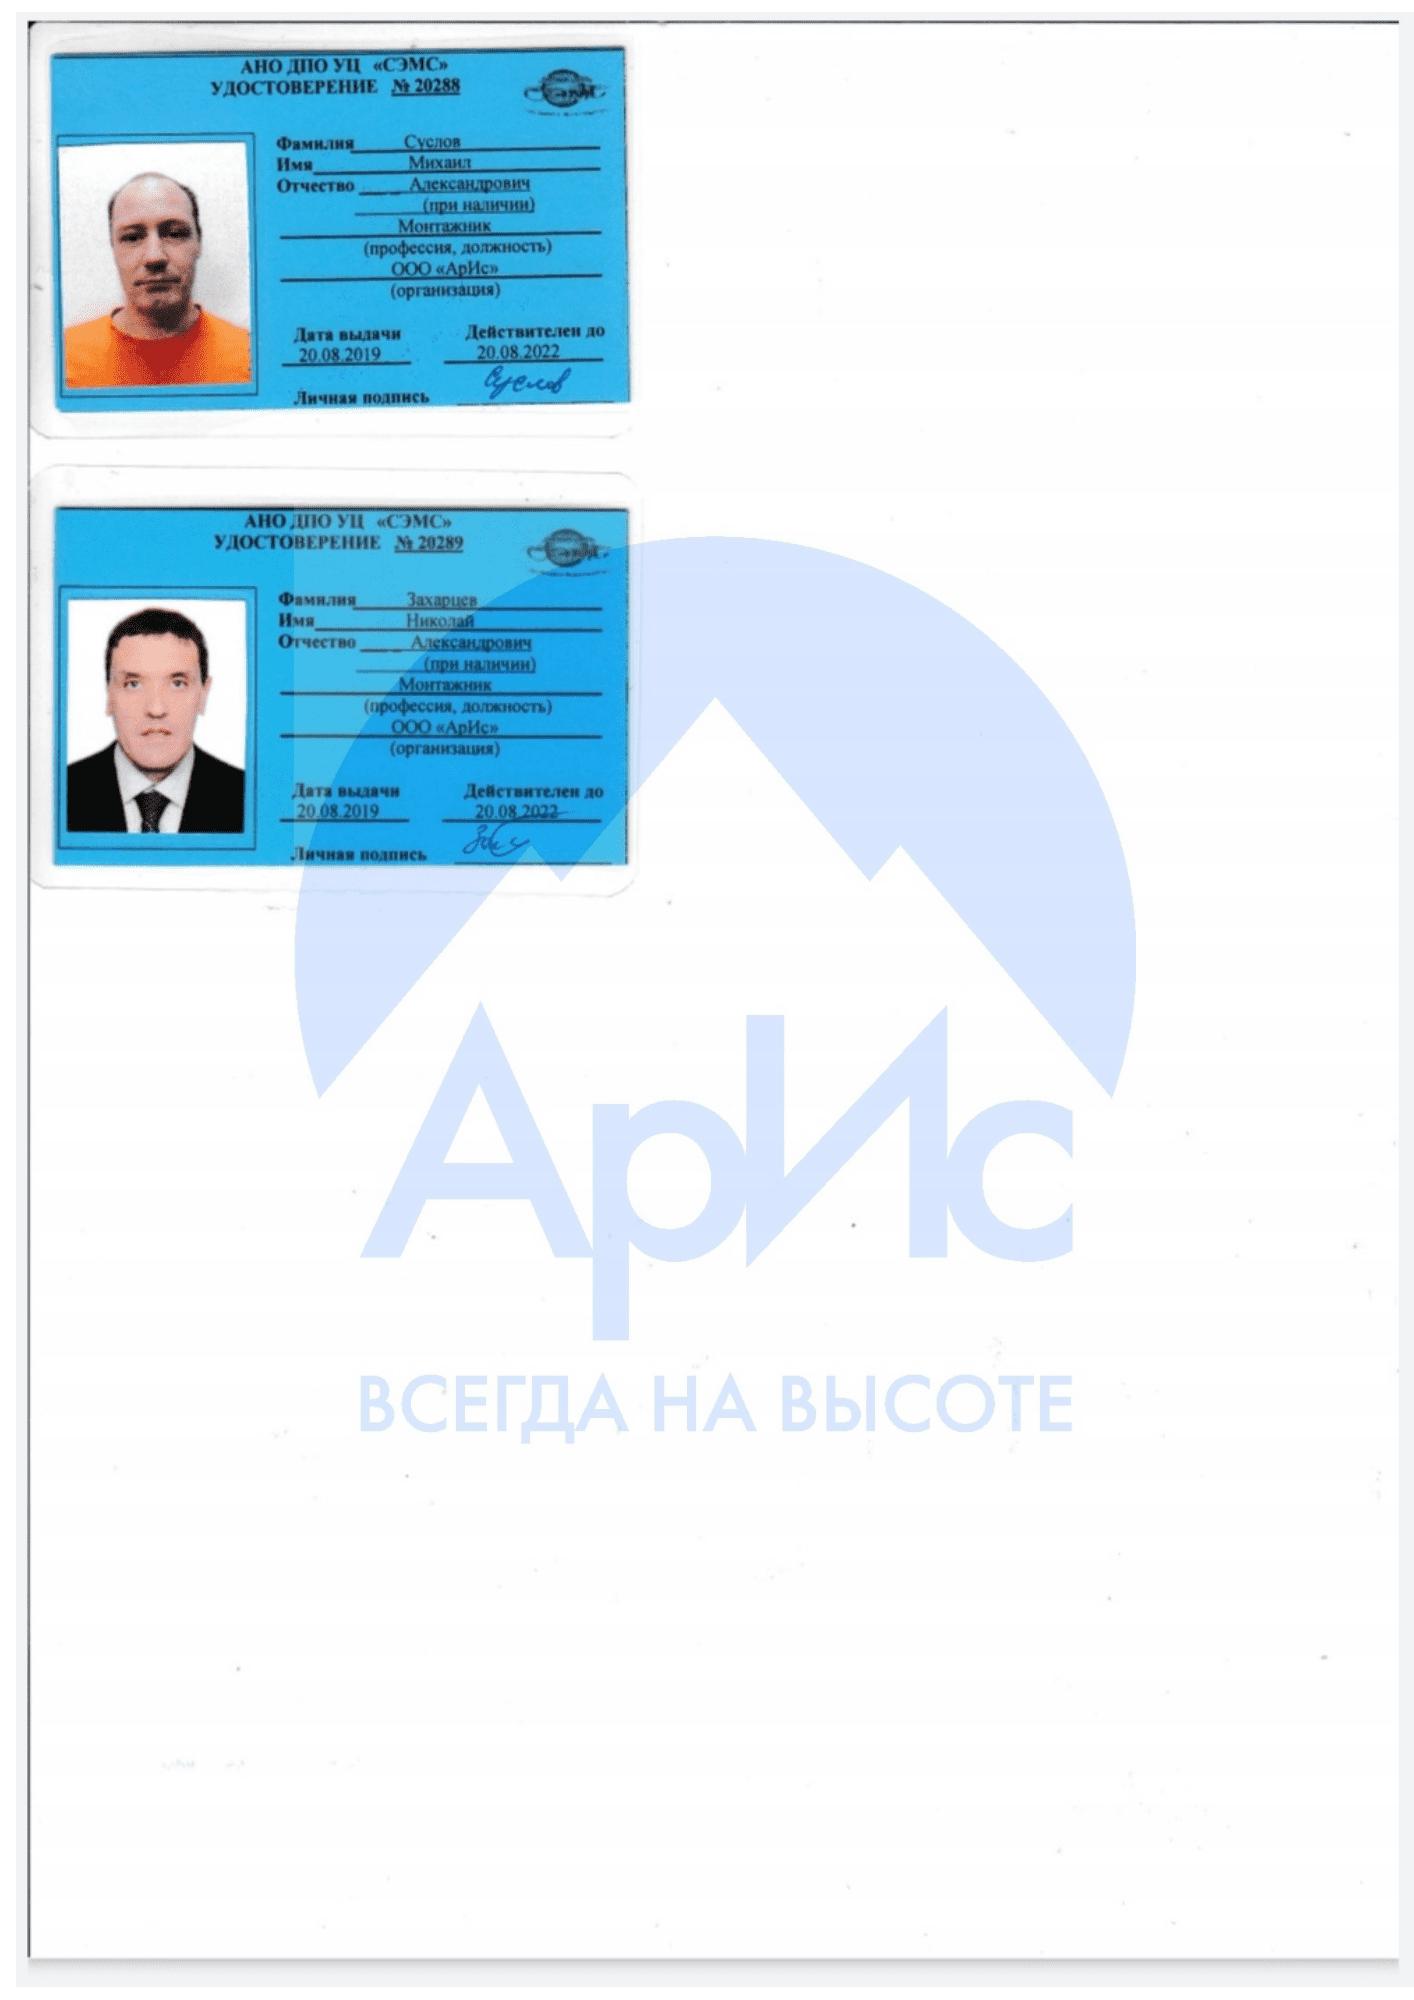 Удостоверения: Суслов М.А. Захарцев Н.А